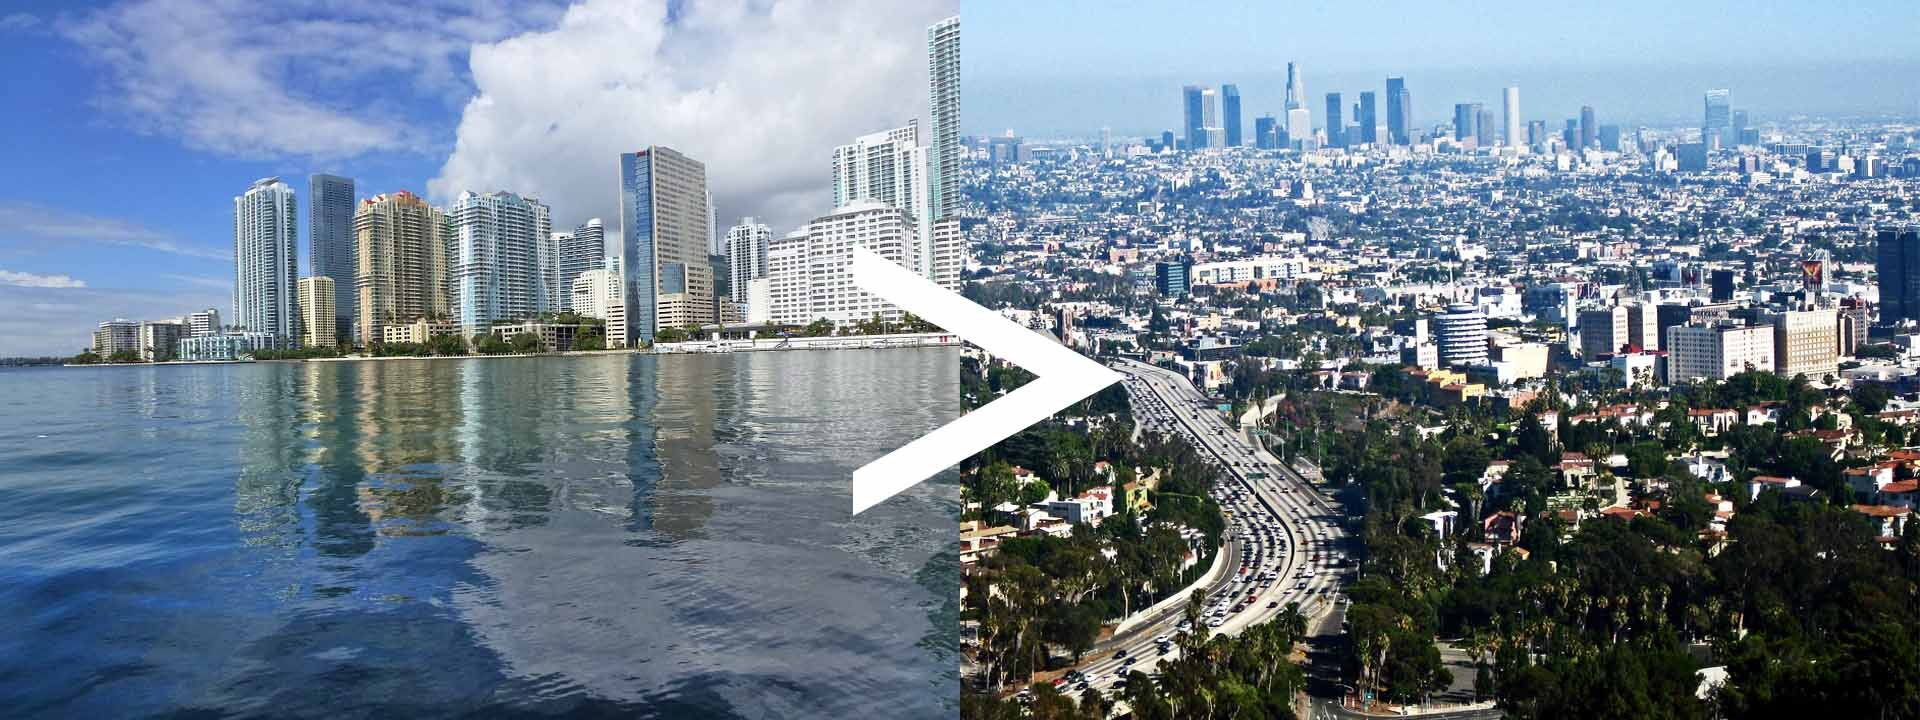 Florida to California Auto Transport